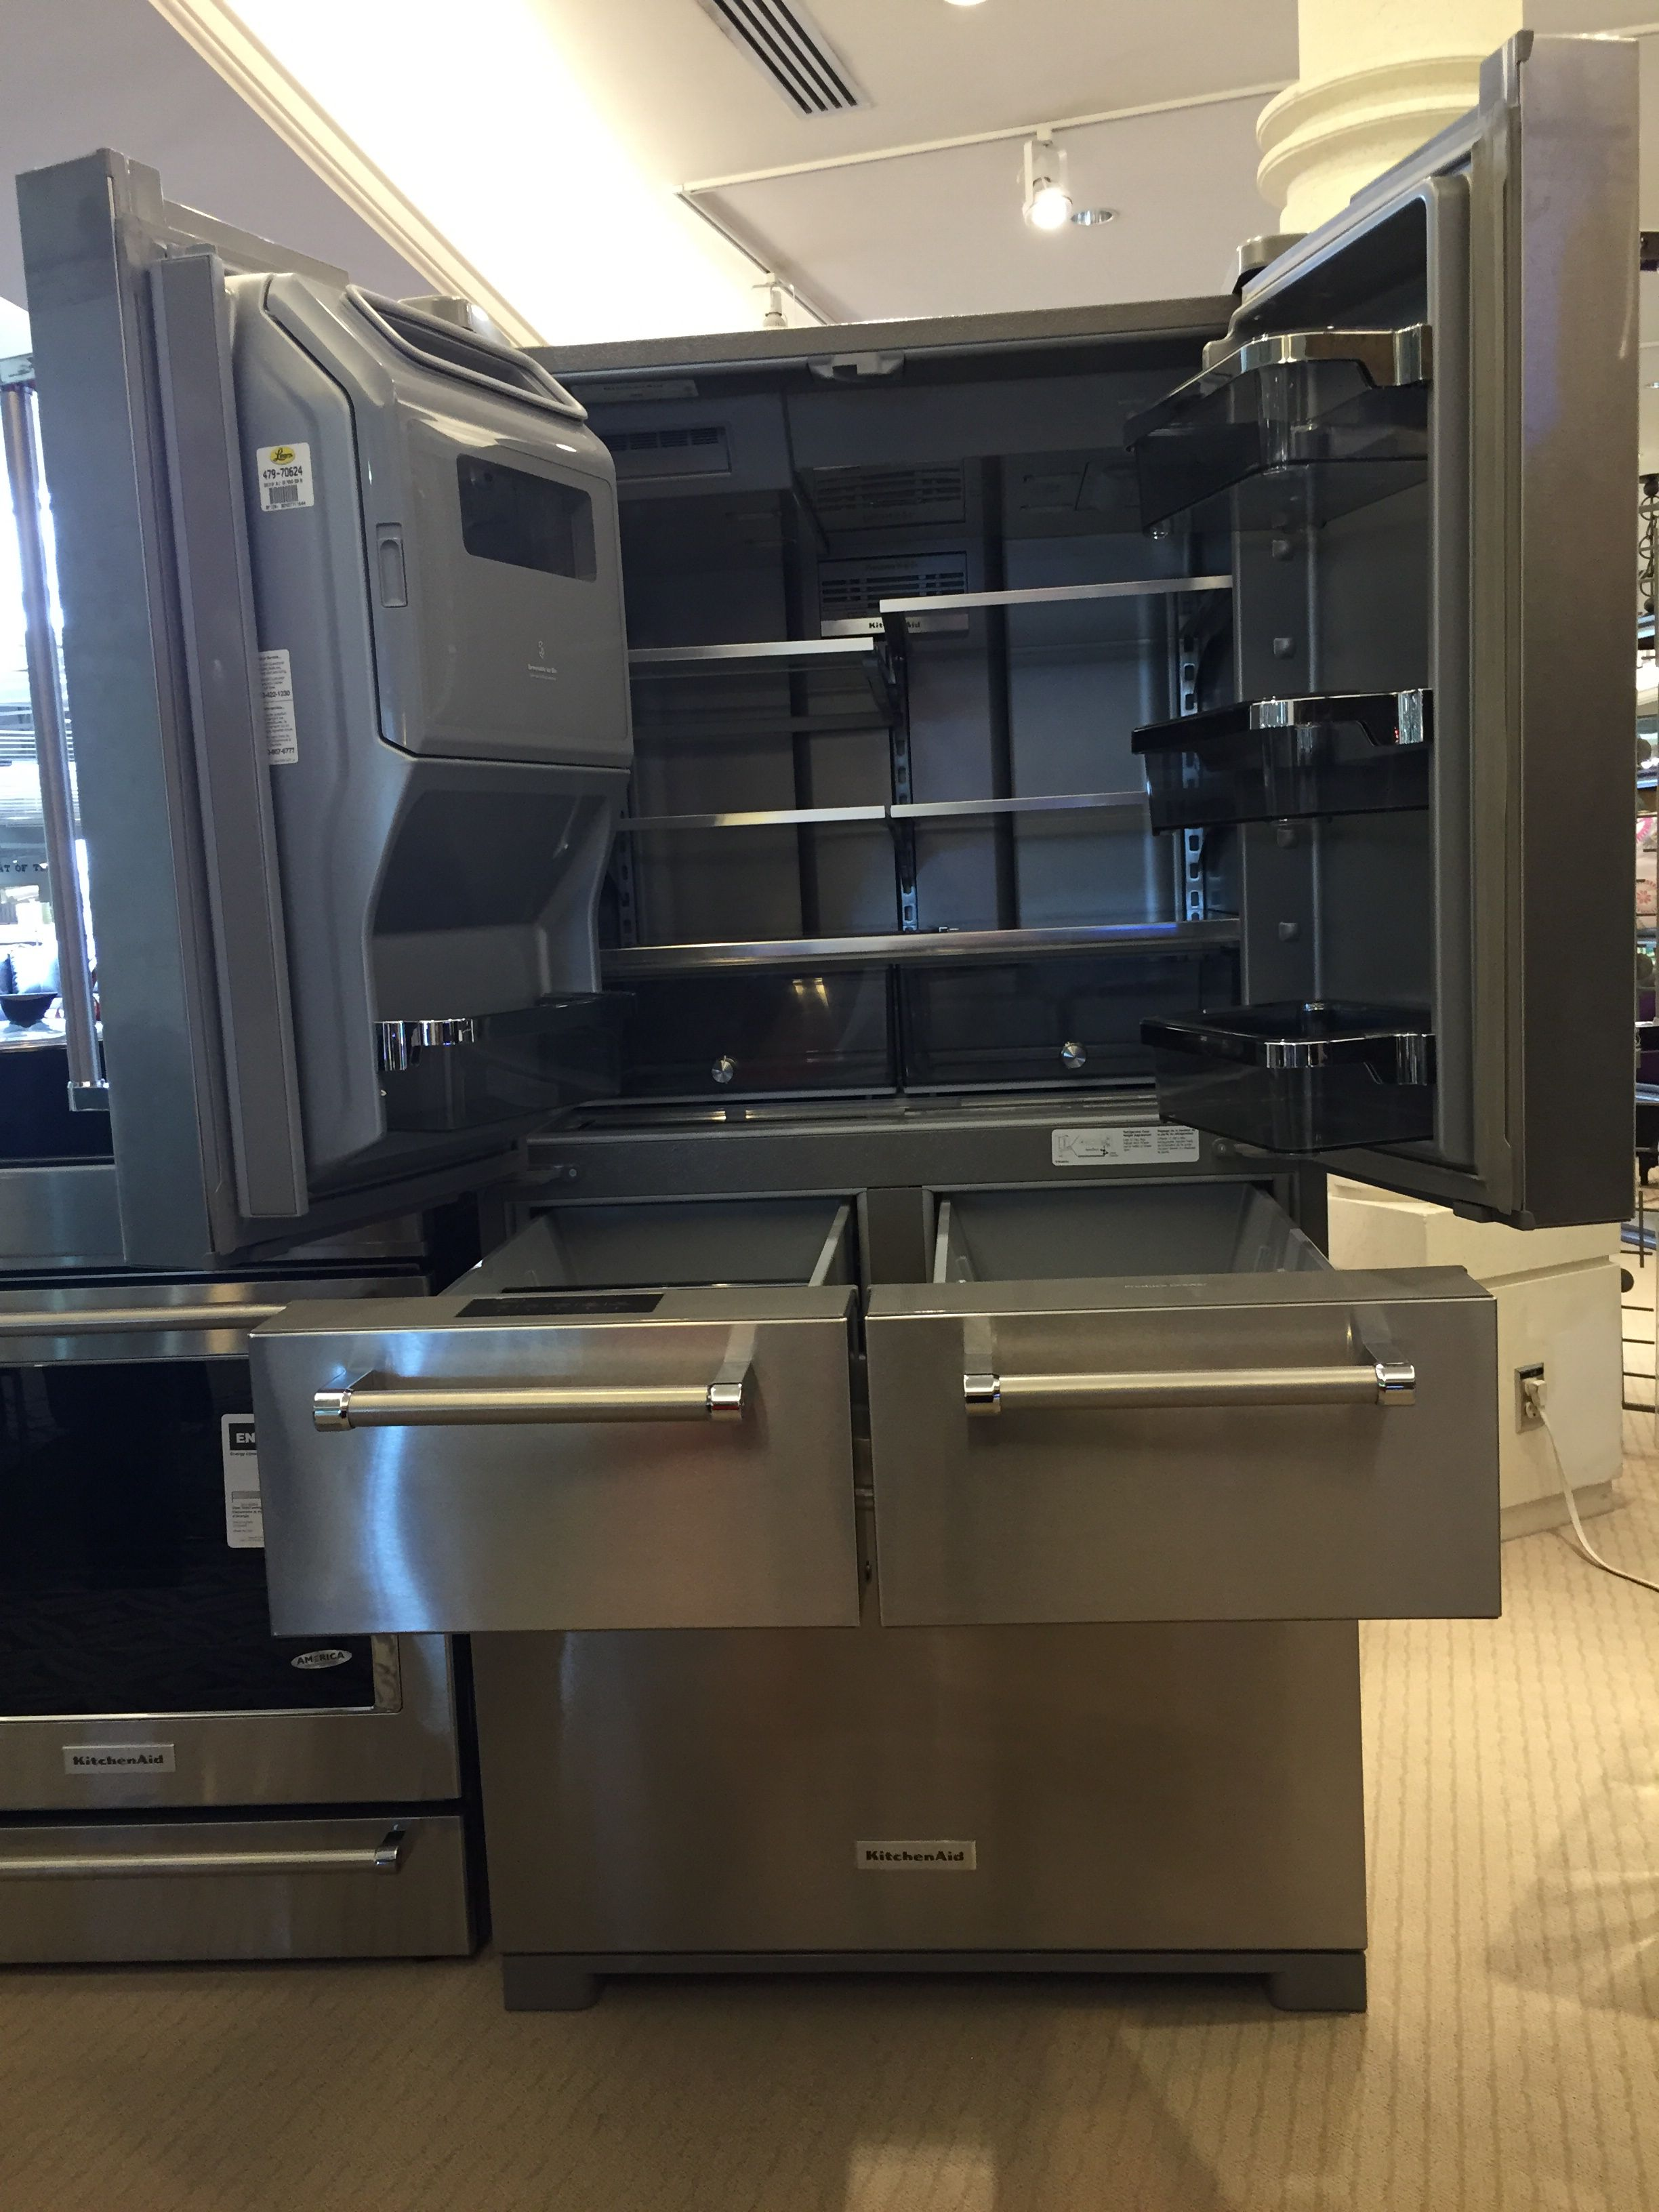 Leon's Calgary - Kitchen Aid 25.8 Fridge SKU 479-70624 - 36.2x36x70.1 - 5 door configuration, water/ice - $4,699